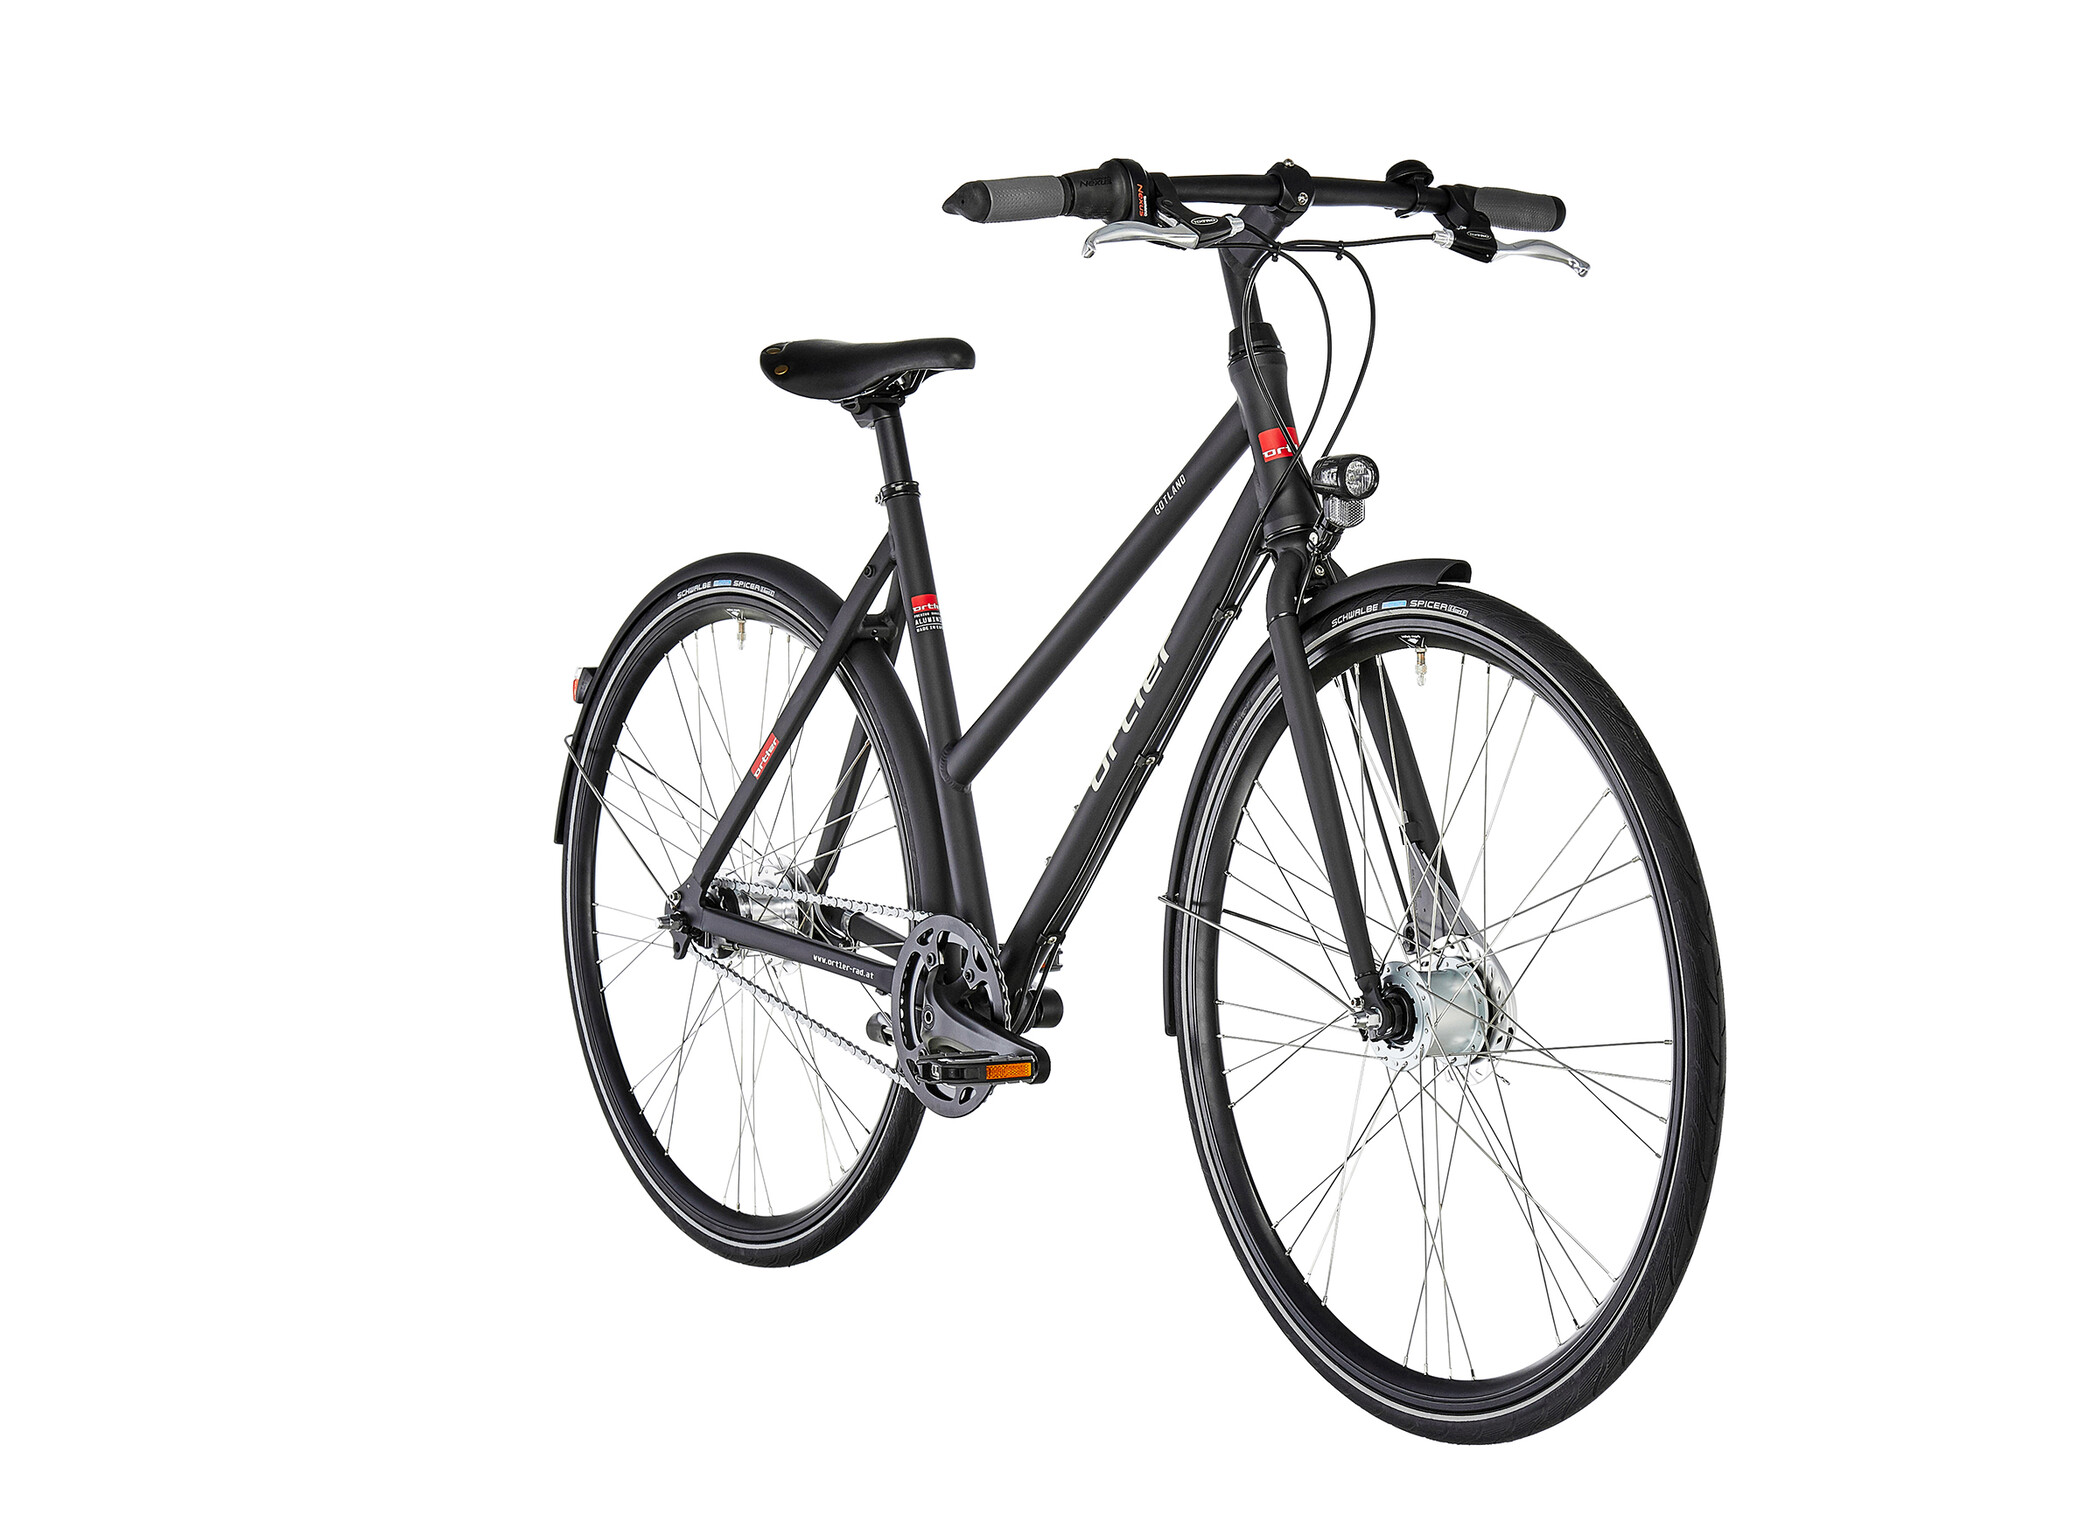 Genuine Company From Germany Pedelecs Electric Bike Community